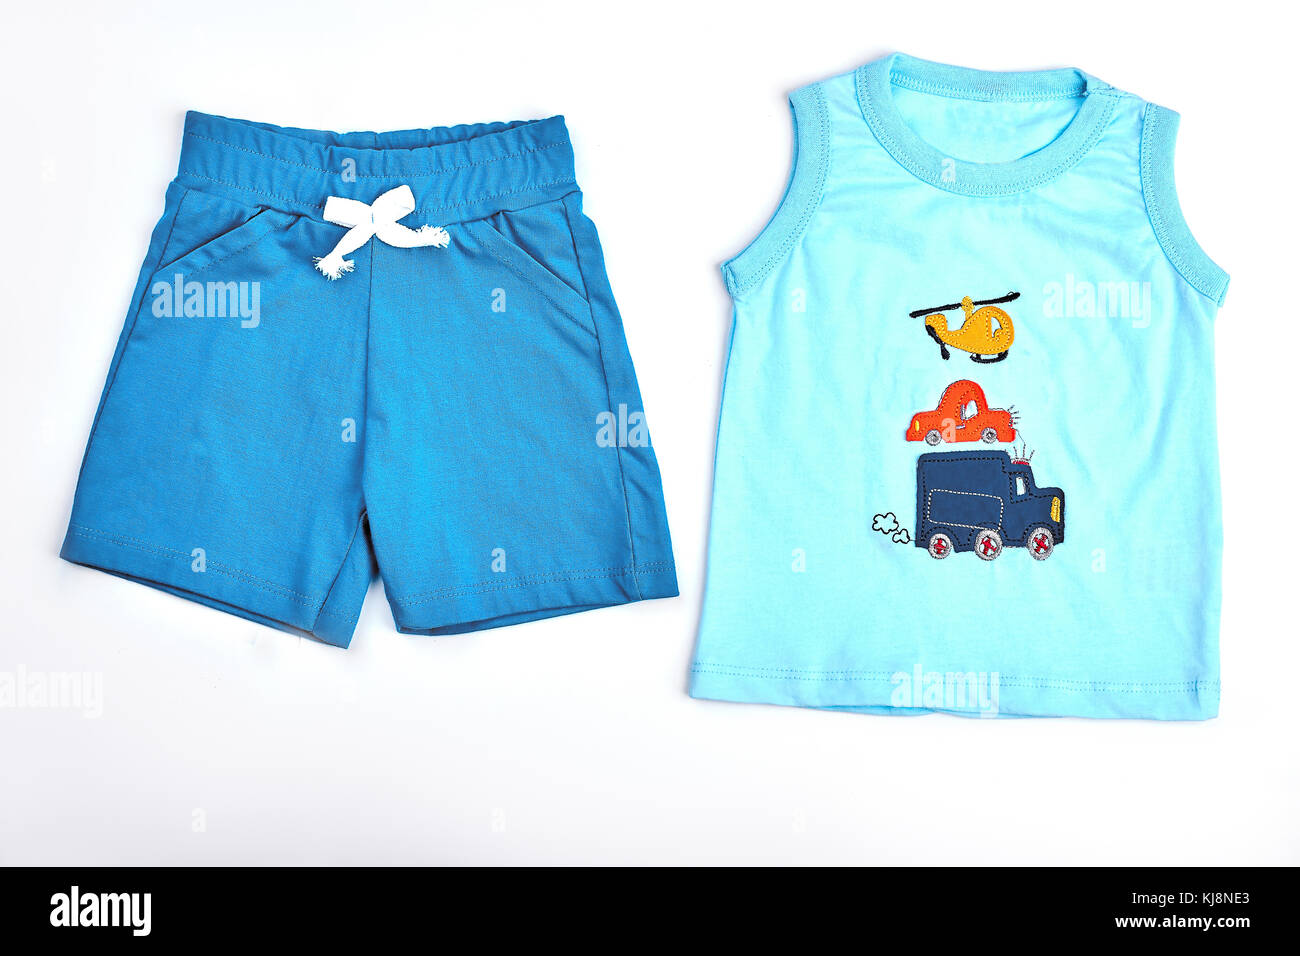 f86b319b0 Baby-boy cotton shorts and t-shirt. Set of natural cotton apparel ...